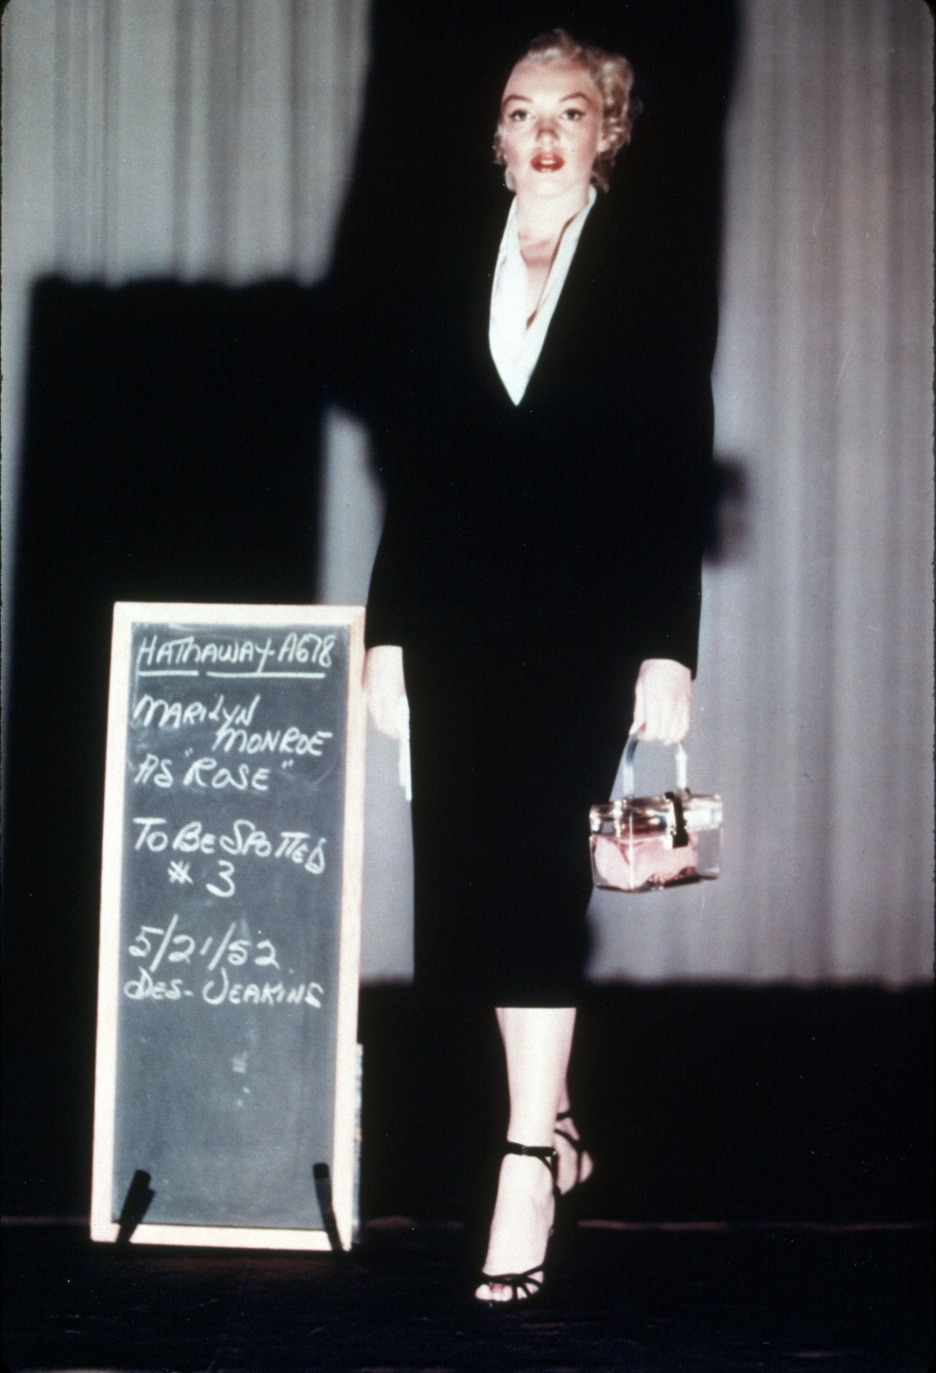 Interesting Photos Of Marilyn Monroe Wardrobe Tests For